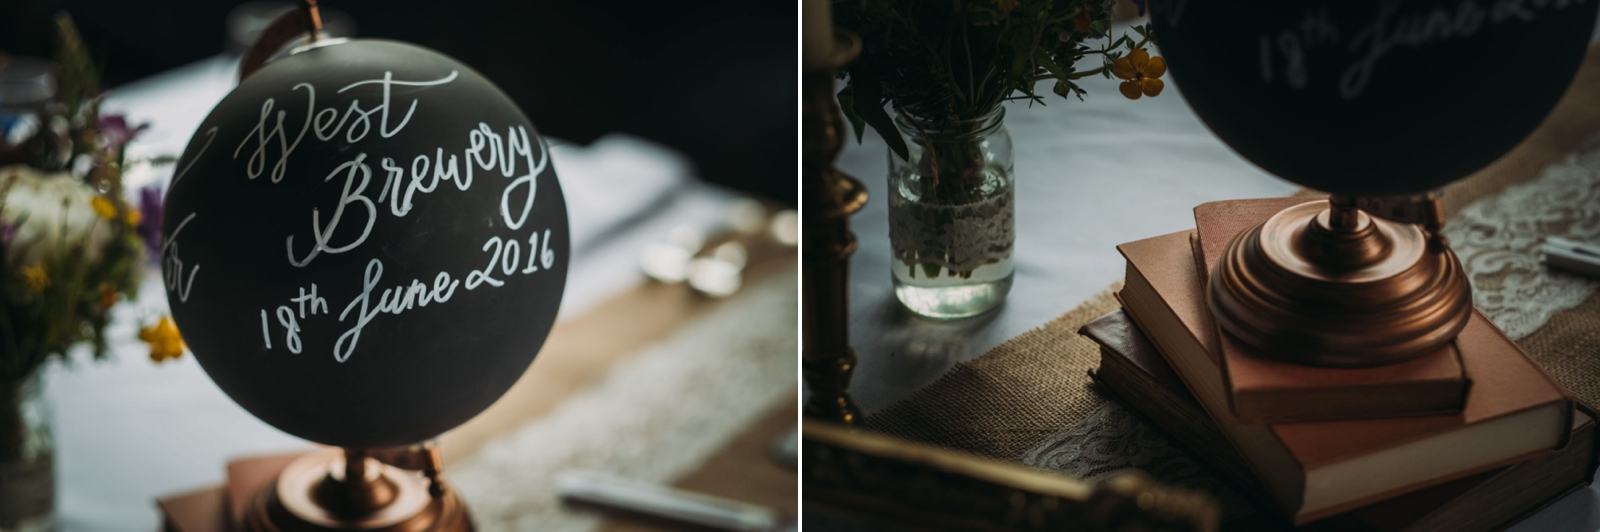 Gillian-Evan-West-Brewery-Jo-Donaldson-Photography-289.jpg